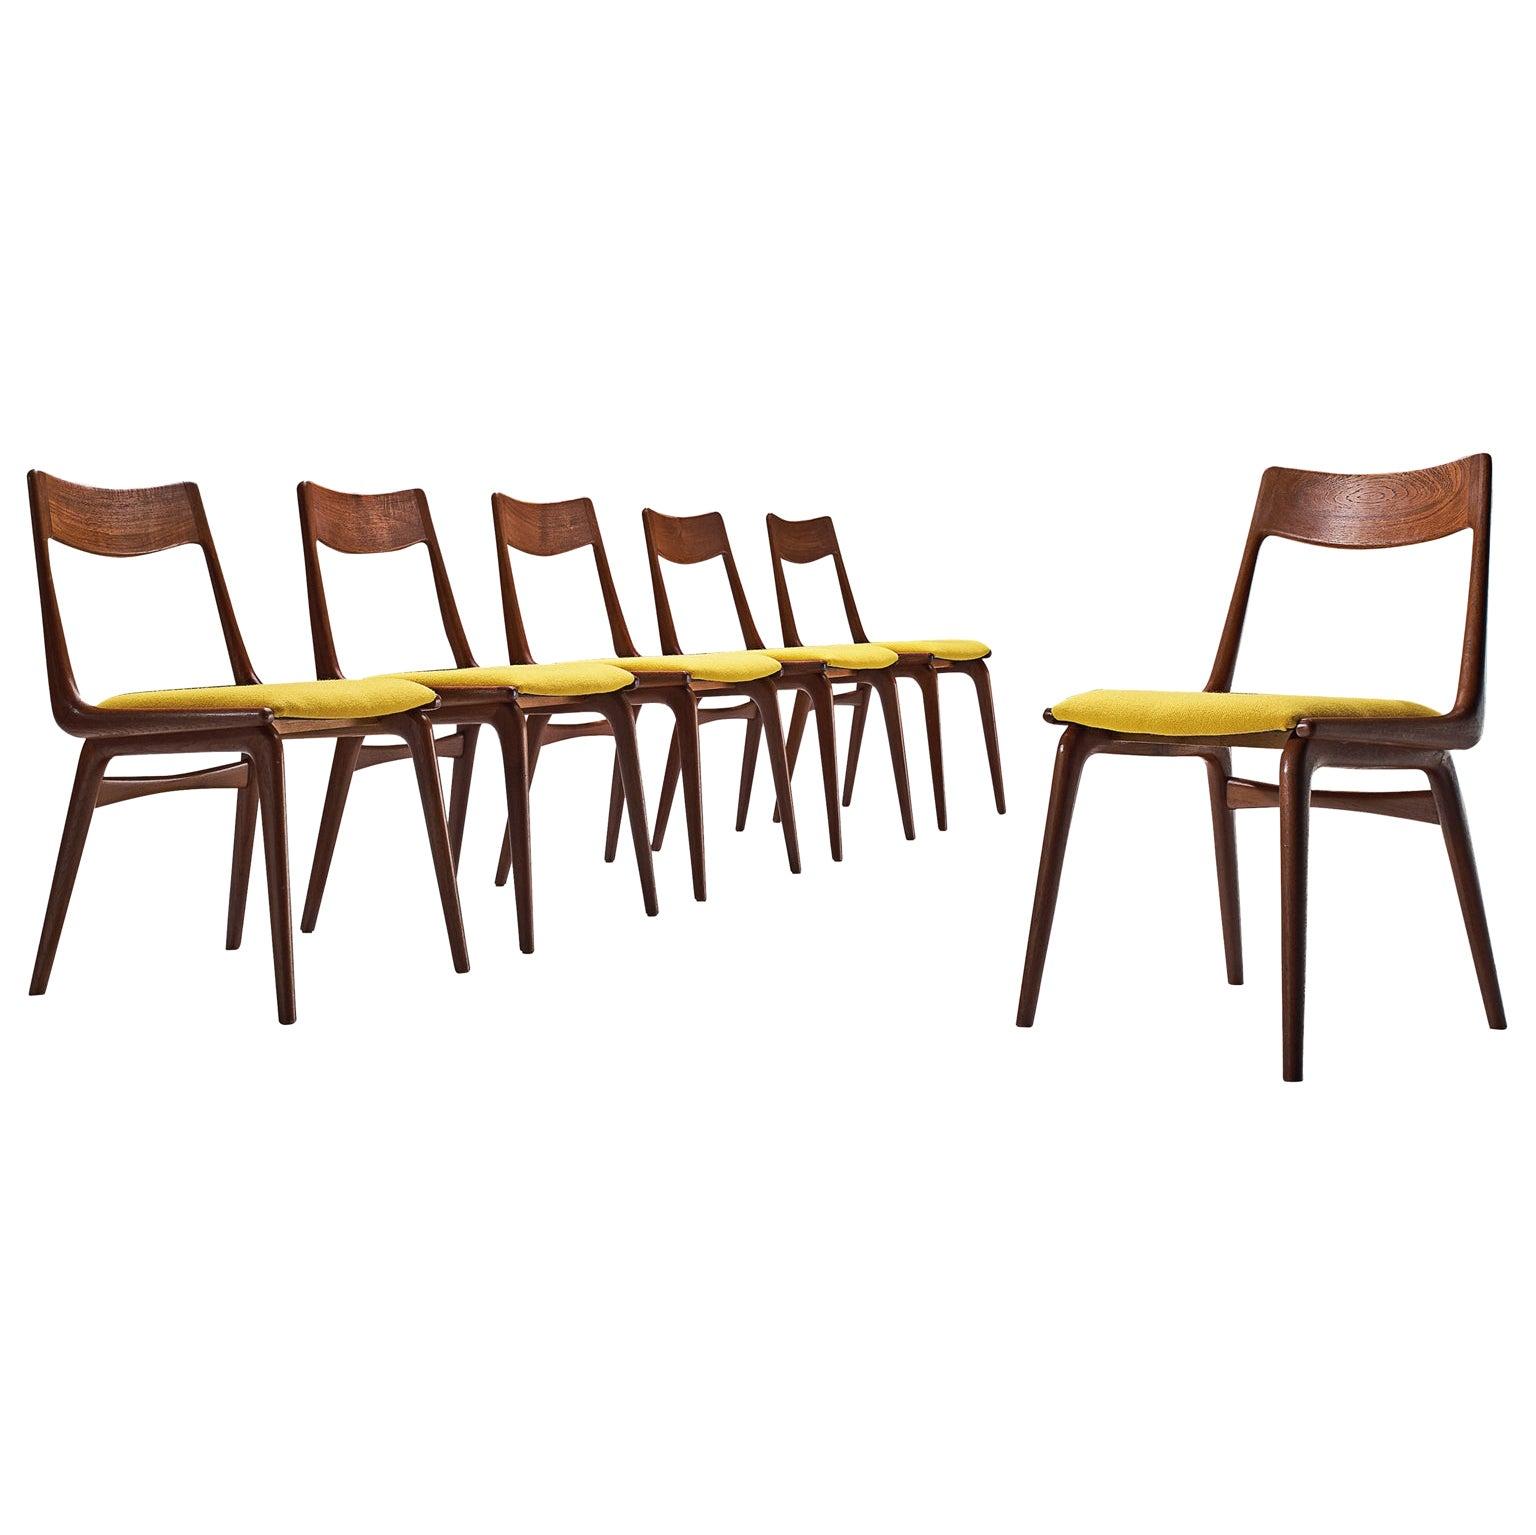 Alfred Christensen Set of 'Boomerang' Chairs in Teak